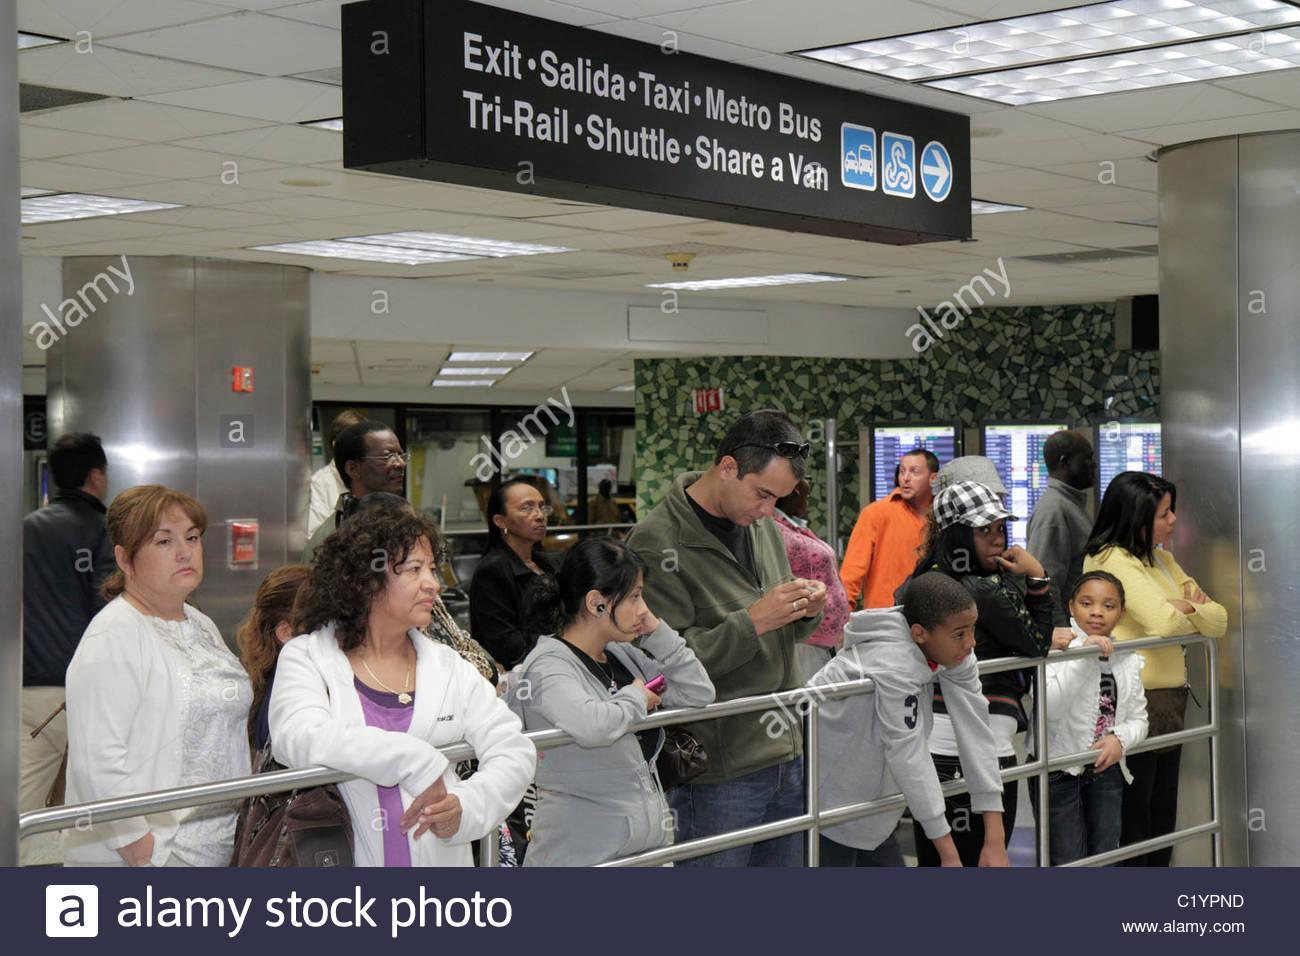 customs airport w stock photos customs airport w stock miami florida miami international airport mia terminal customs arrivals hispanic black man w boy girl families